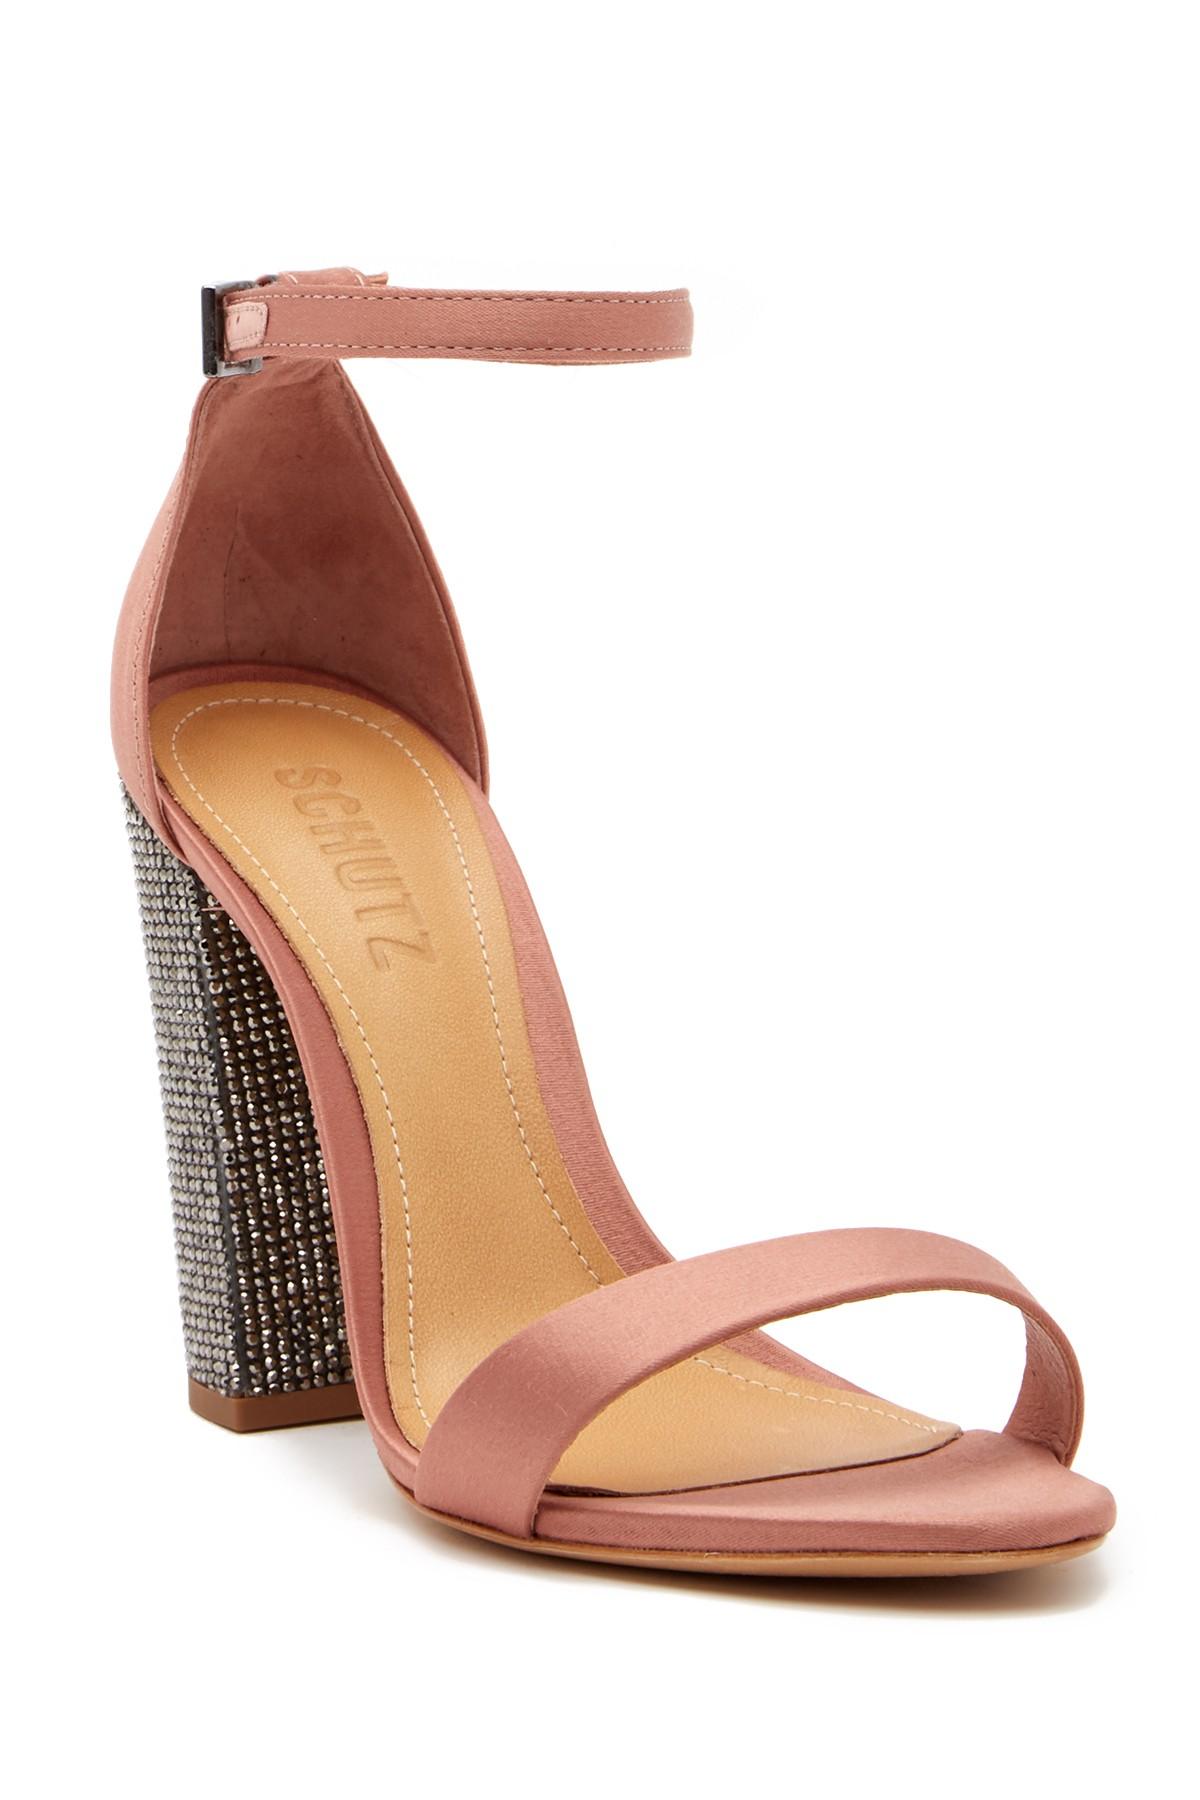 446bd4f3e07 Hara Crystal Embellished Block Heel Sandal by Schutz on  HauteLook ...